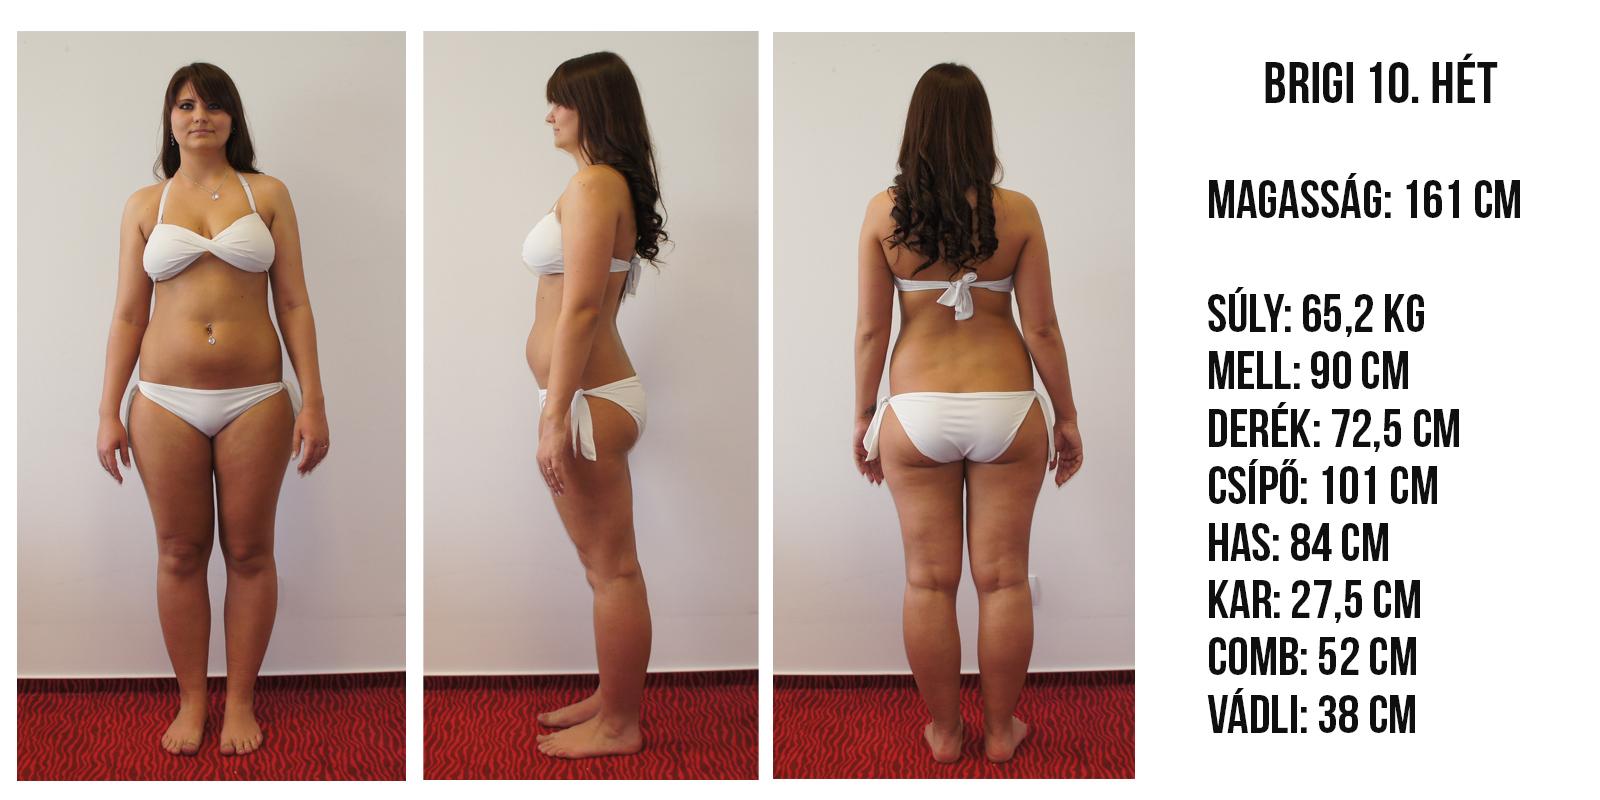 Fogyni 3 kg per 1 nap